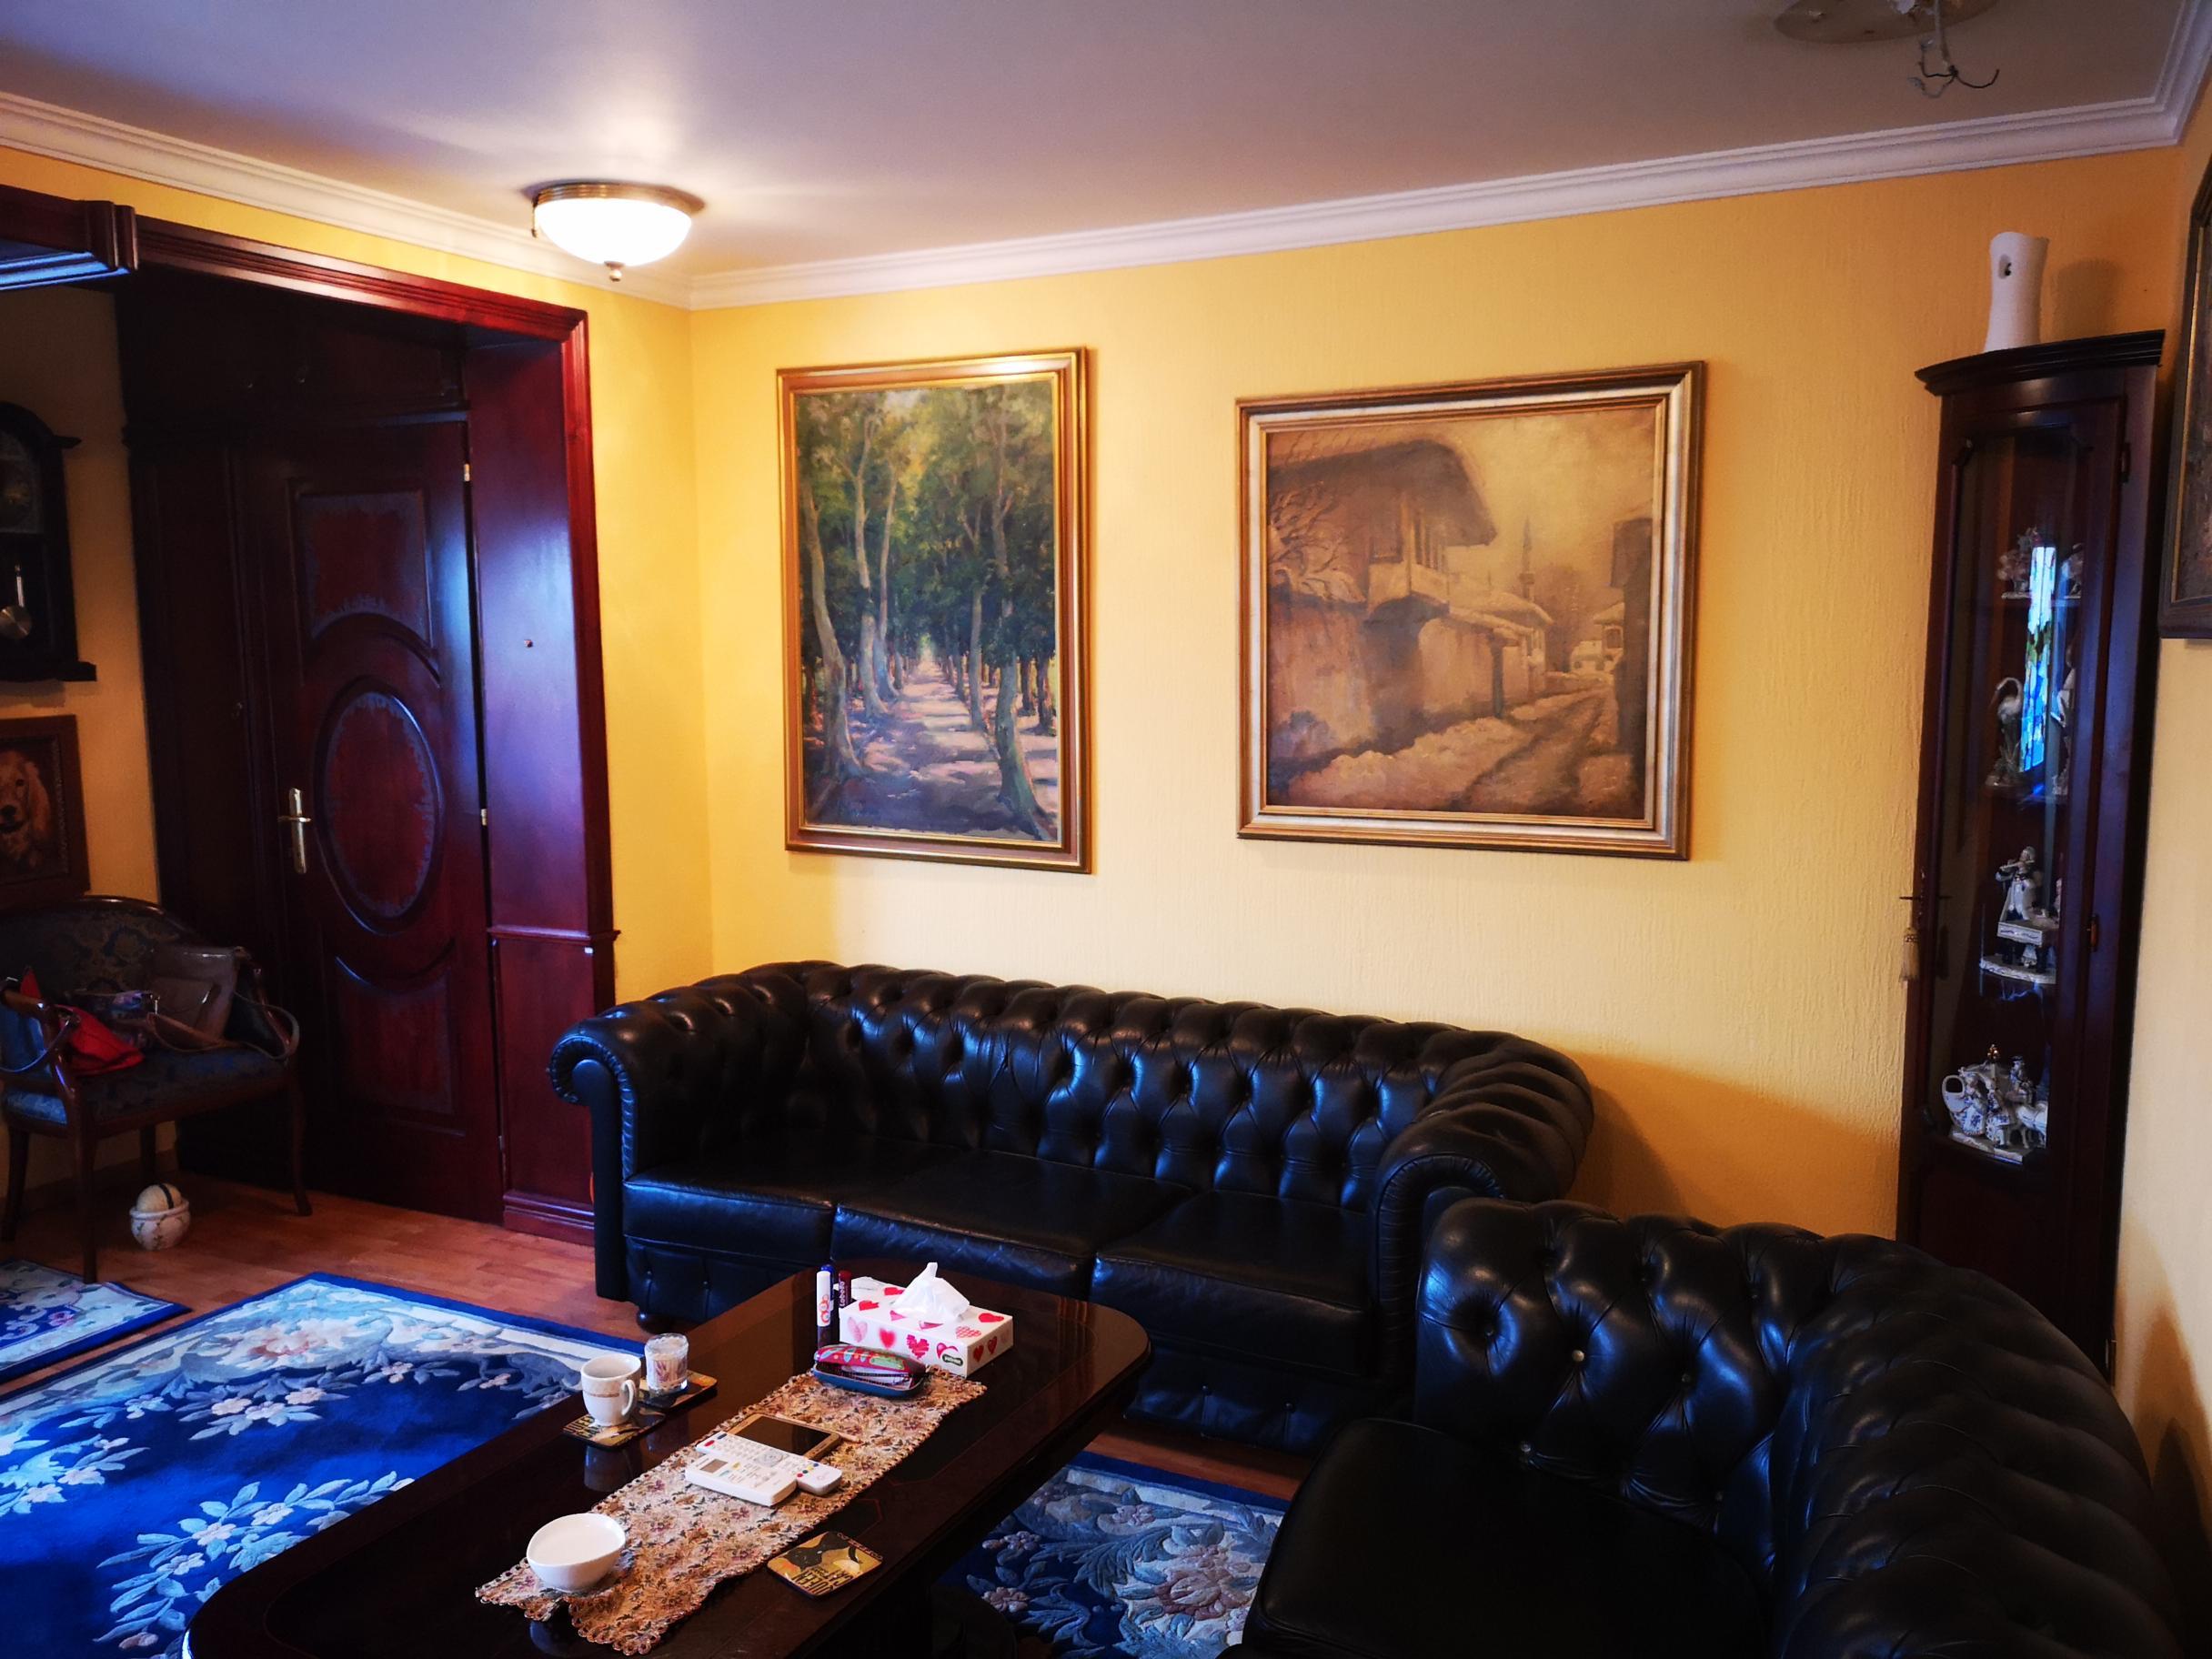 100 m2, Stan, Blok 31, Merkator, agencijski ID: 40867